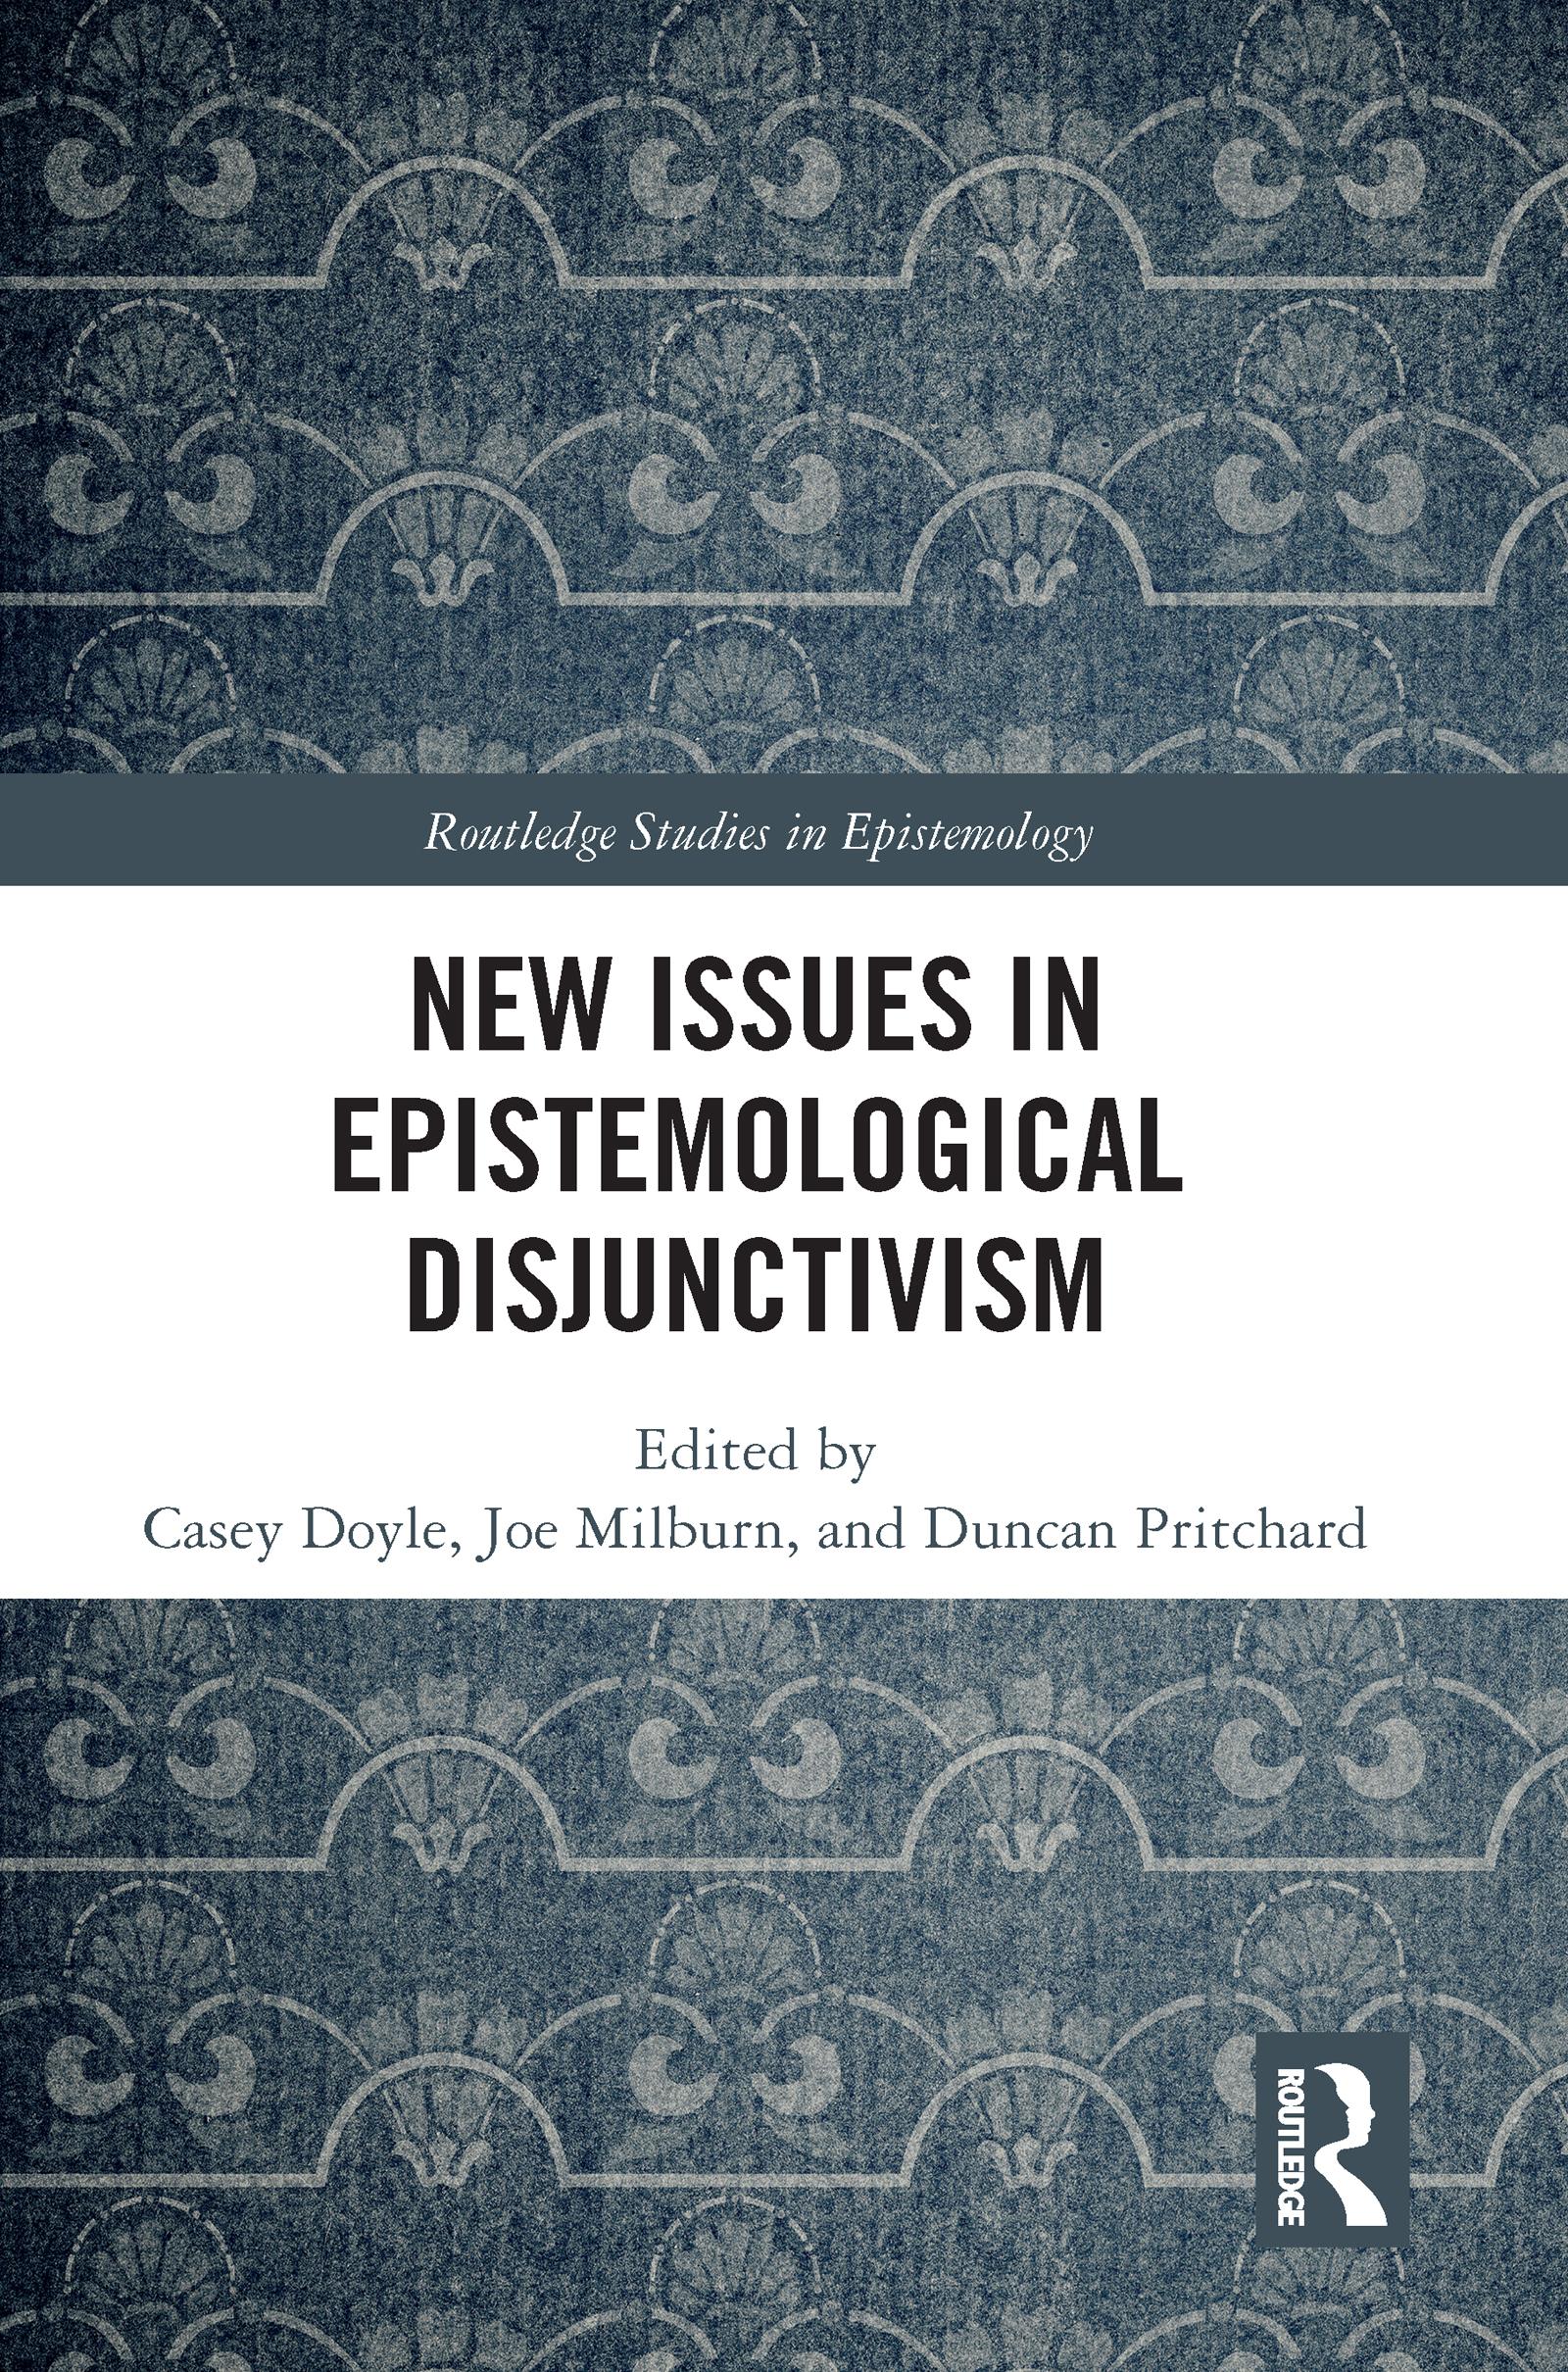 New Issues in Epistemological Disjunctivism